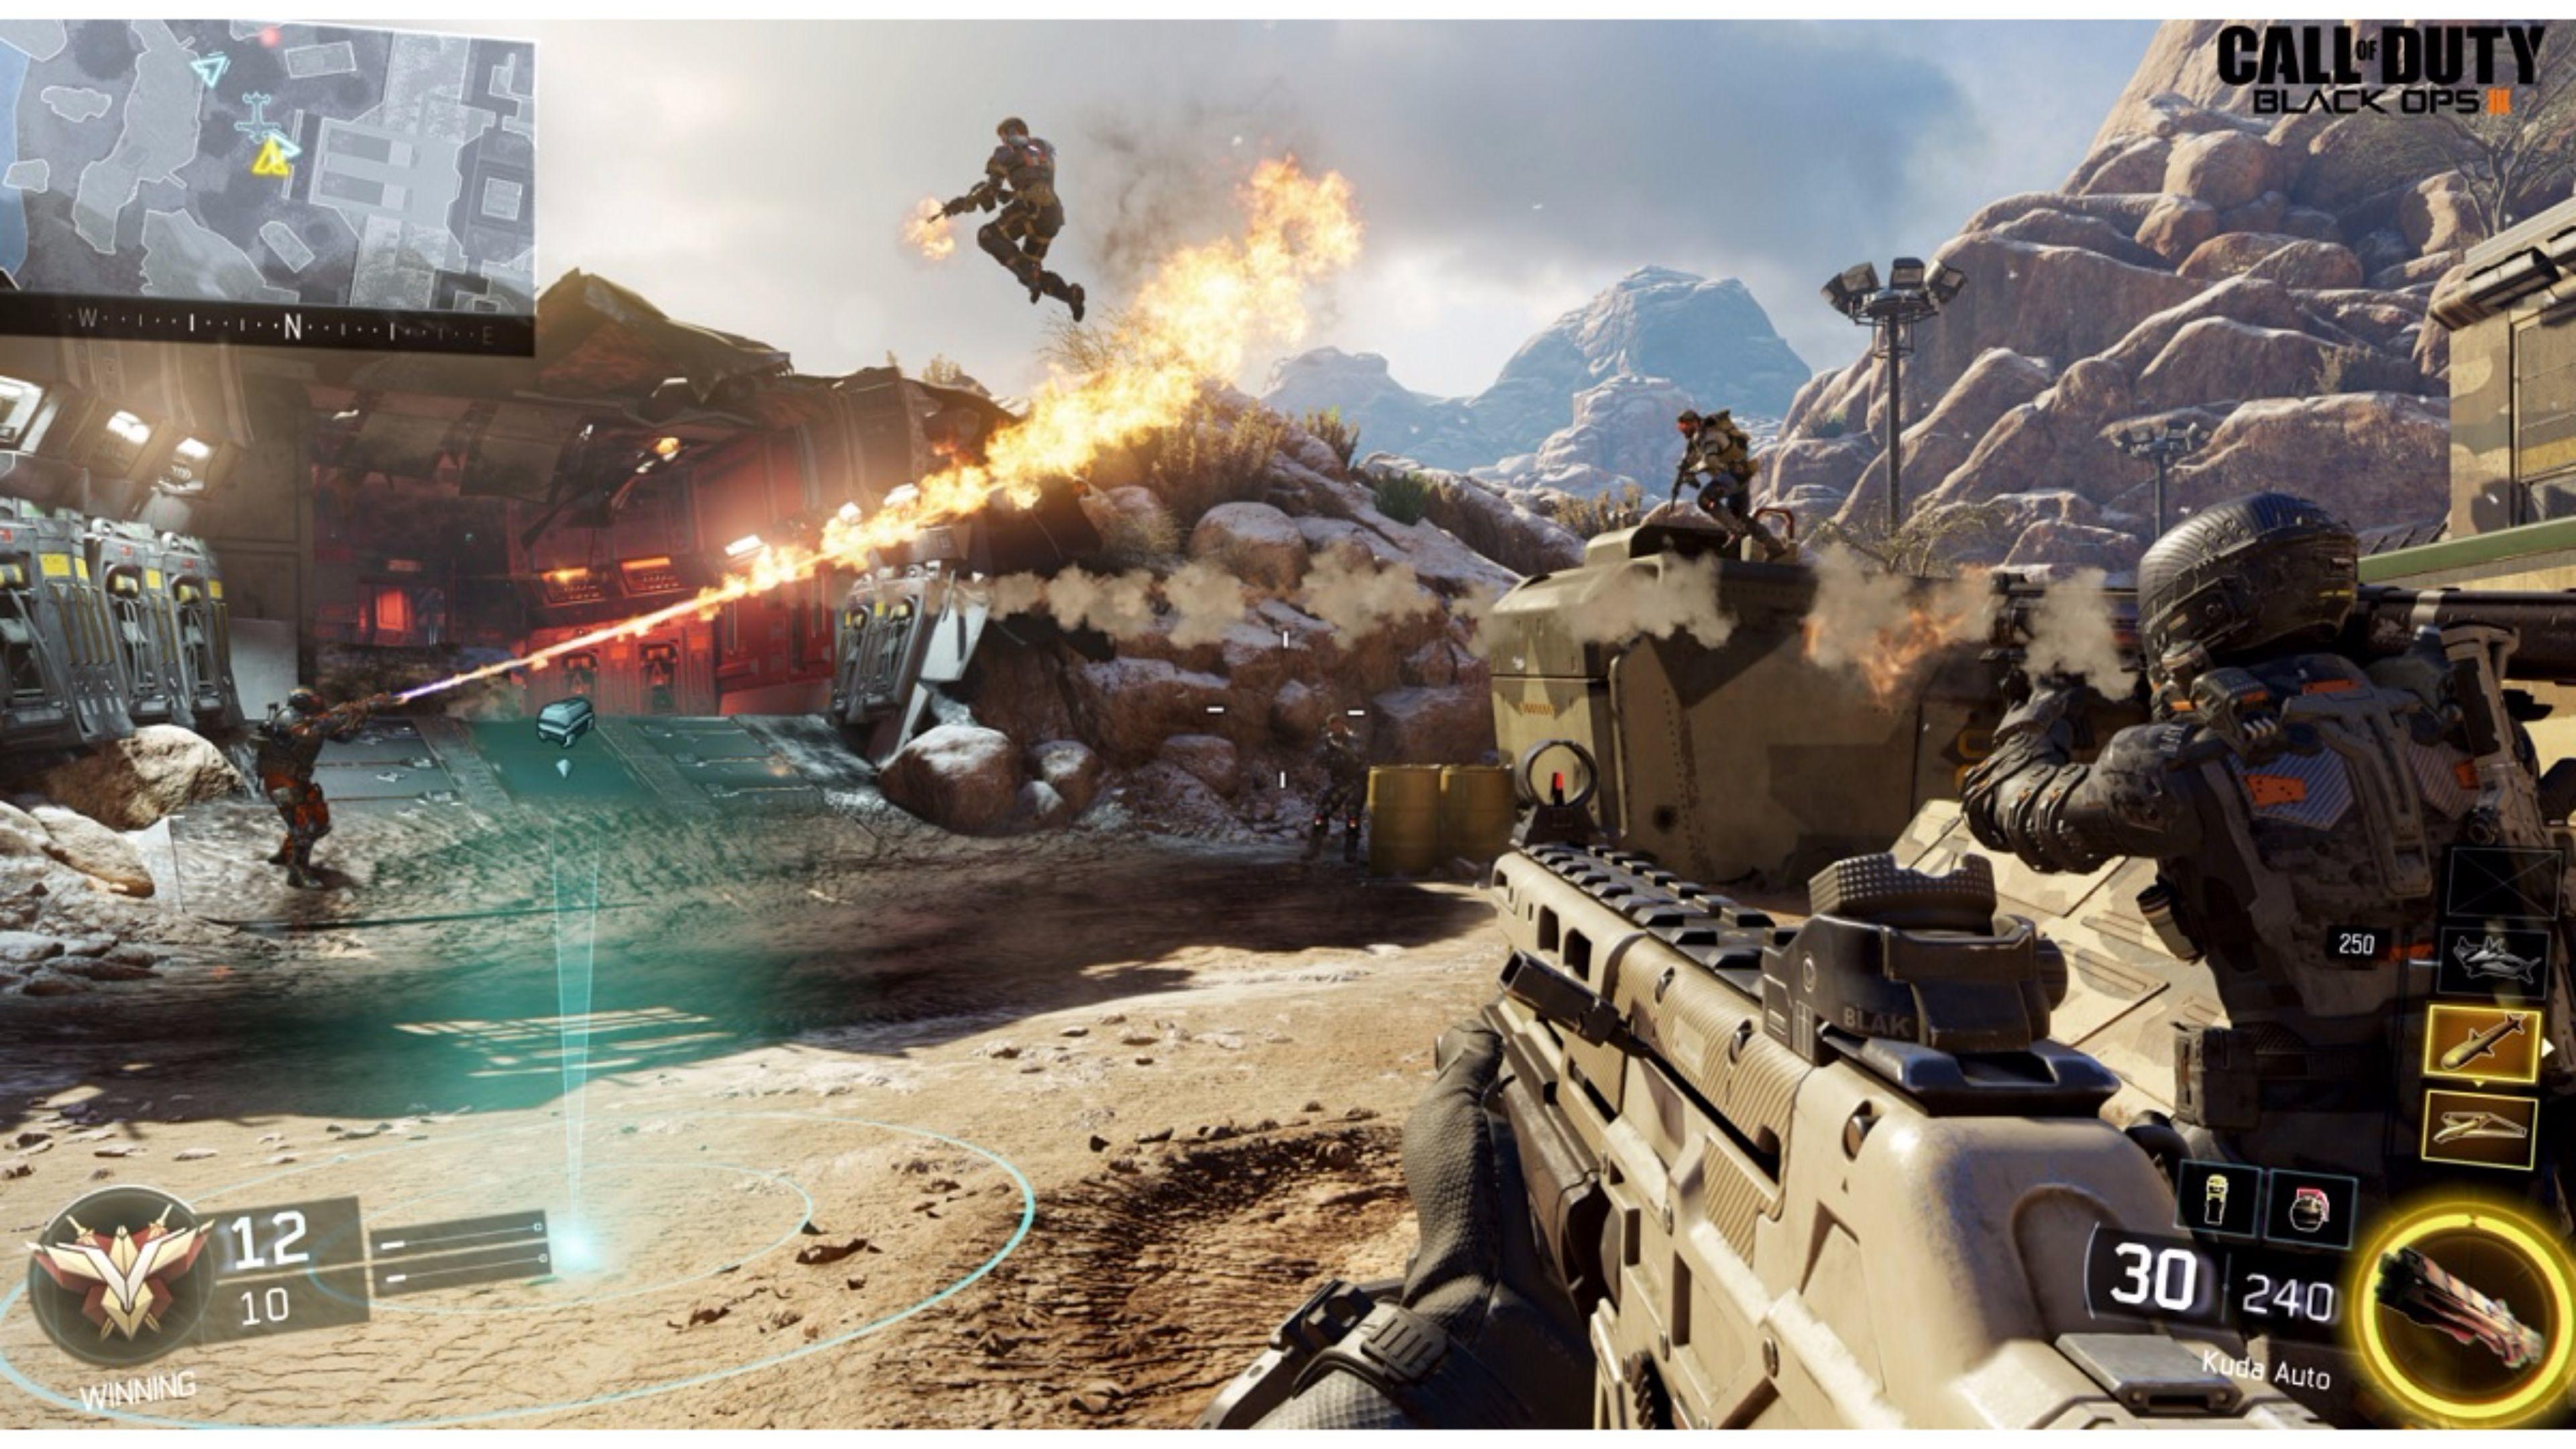 96 Call Of Duty Wallpaper 4k Call Of Duty Wallpaper 4k Call Of